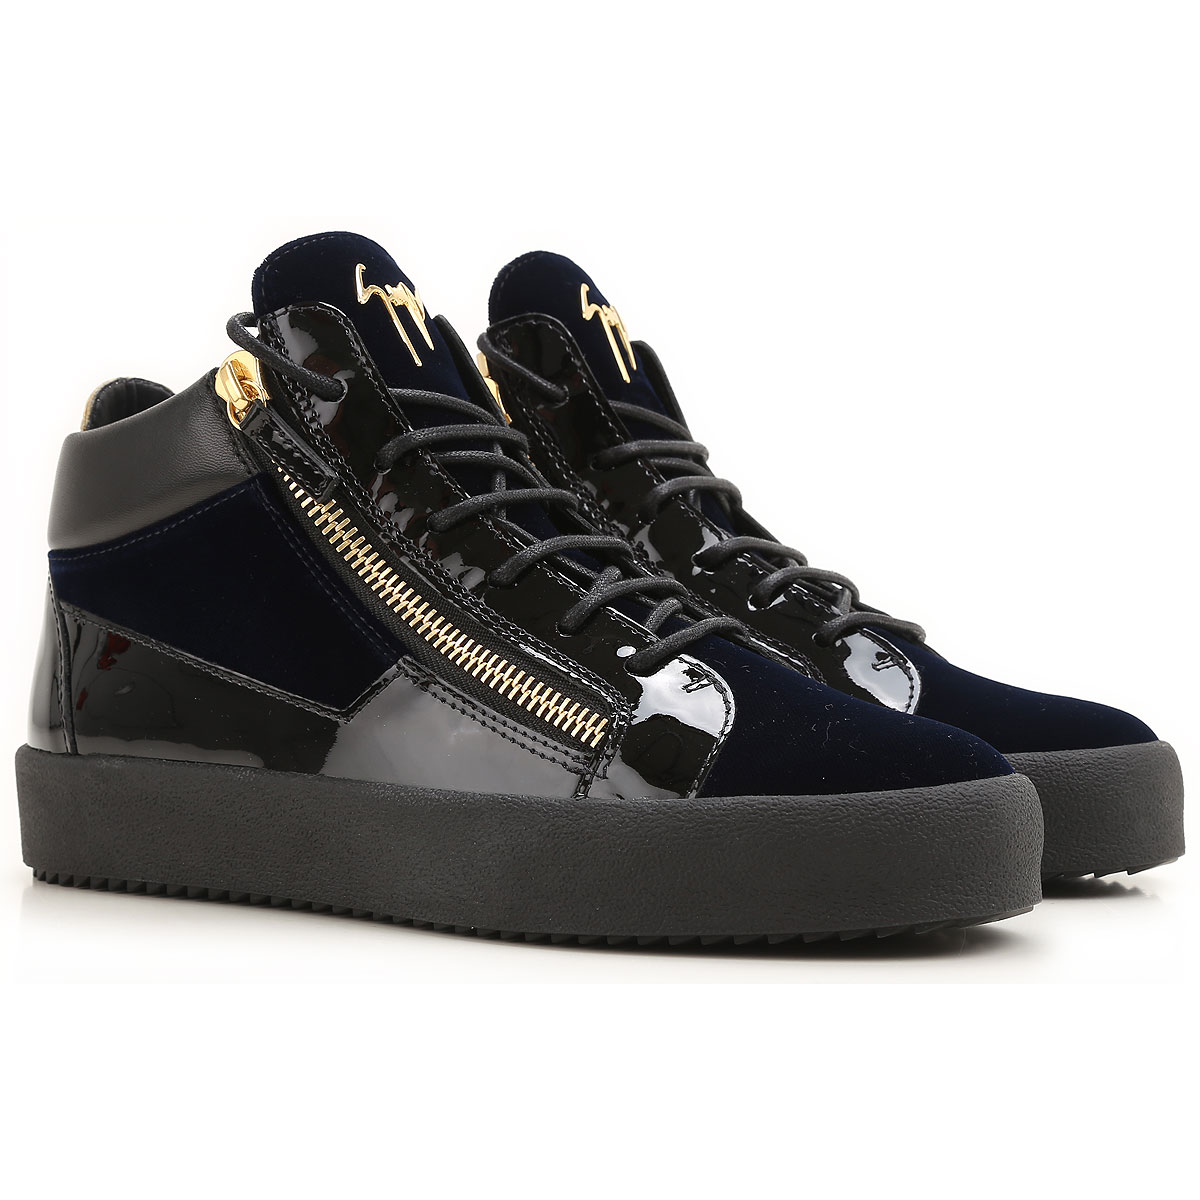 magasin d'usine f19ec 5f0e6 Mens Shoes Giuseppe Zanotti Design, Style code: ru70010-007-